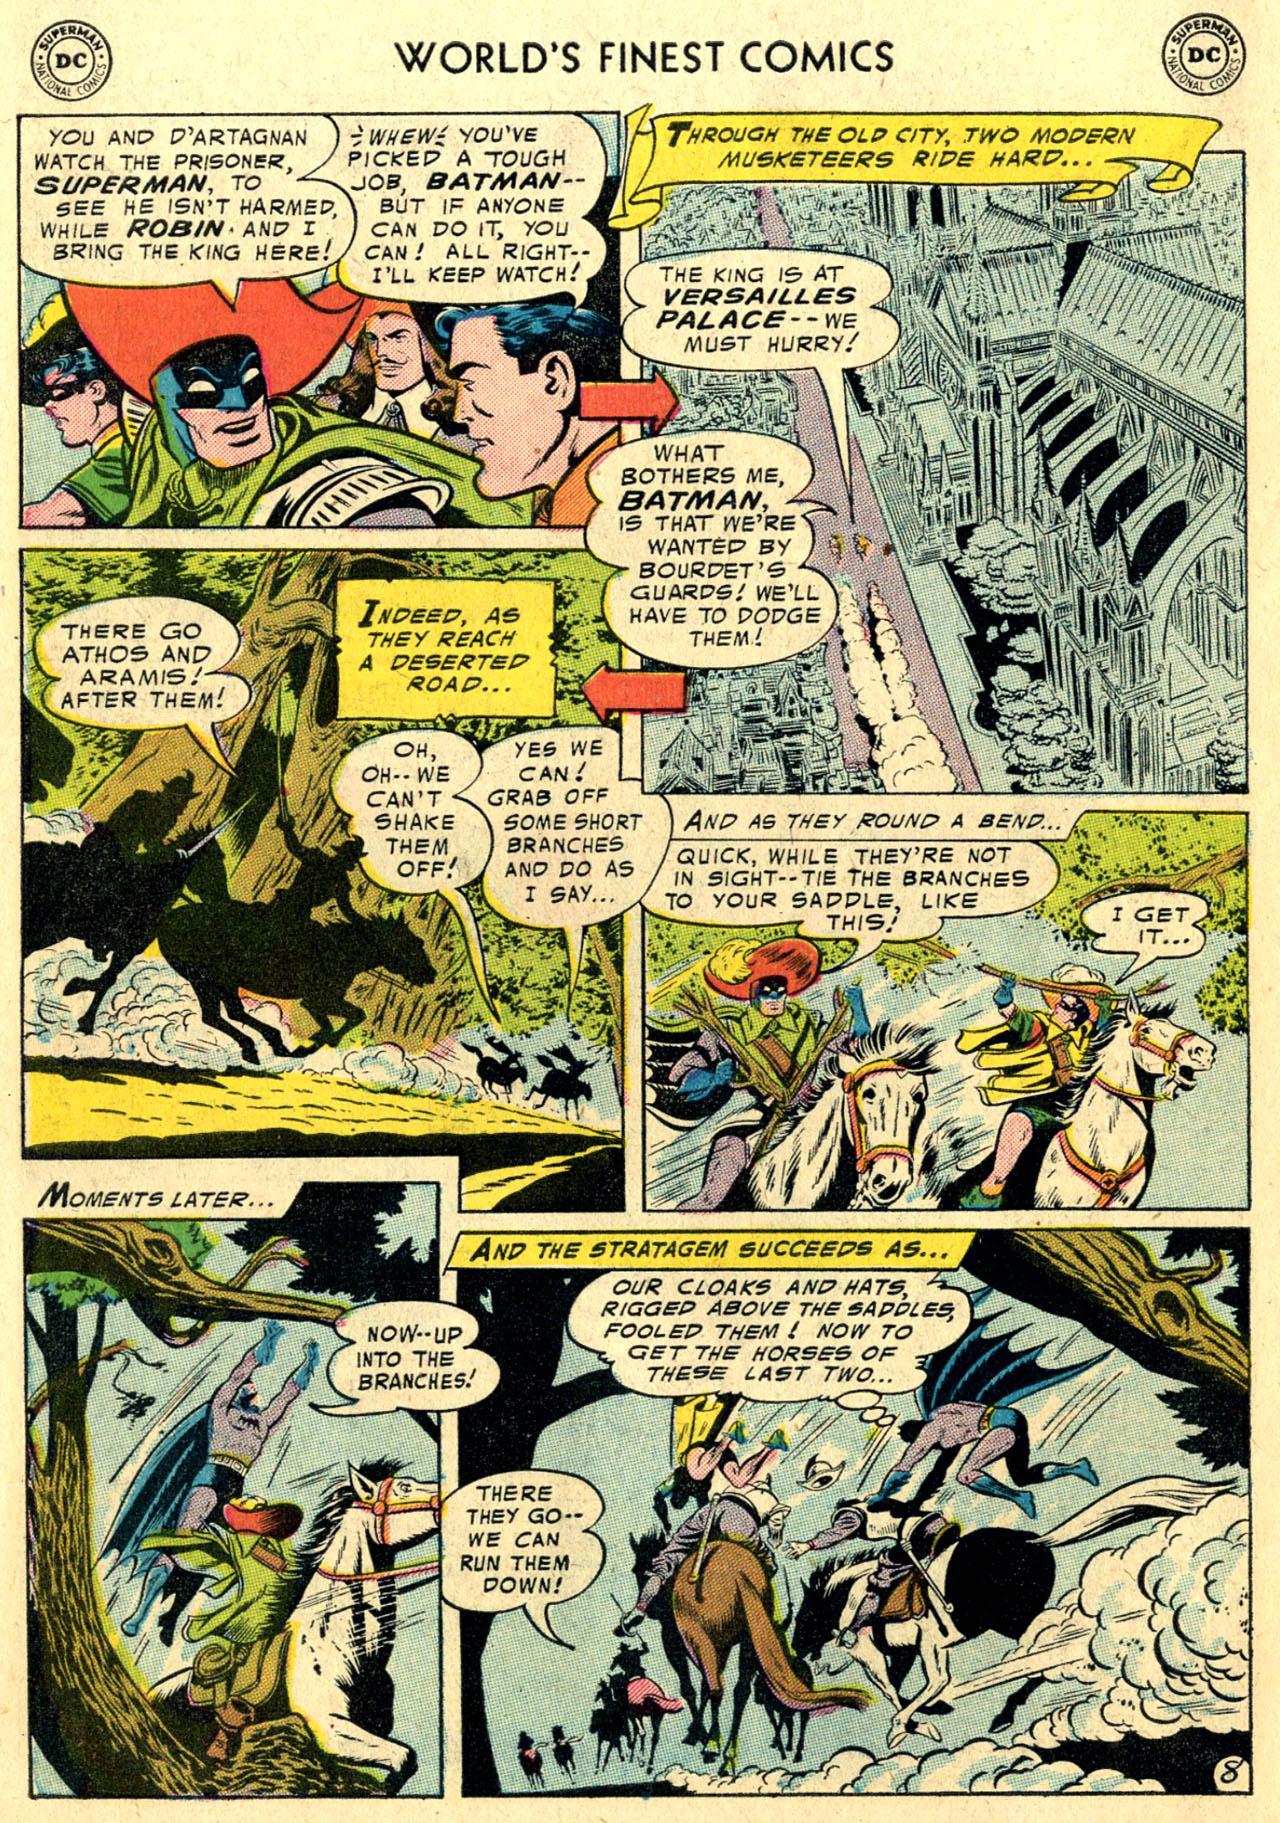 Read online World's Finest Comics comic -  Issue #82 - 10